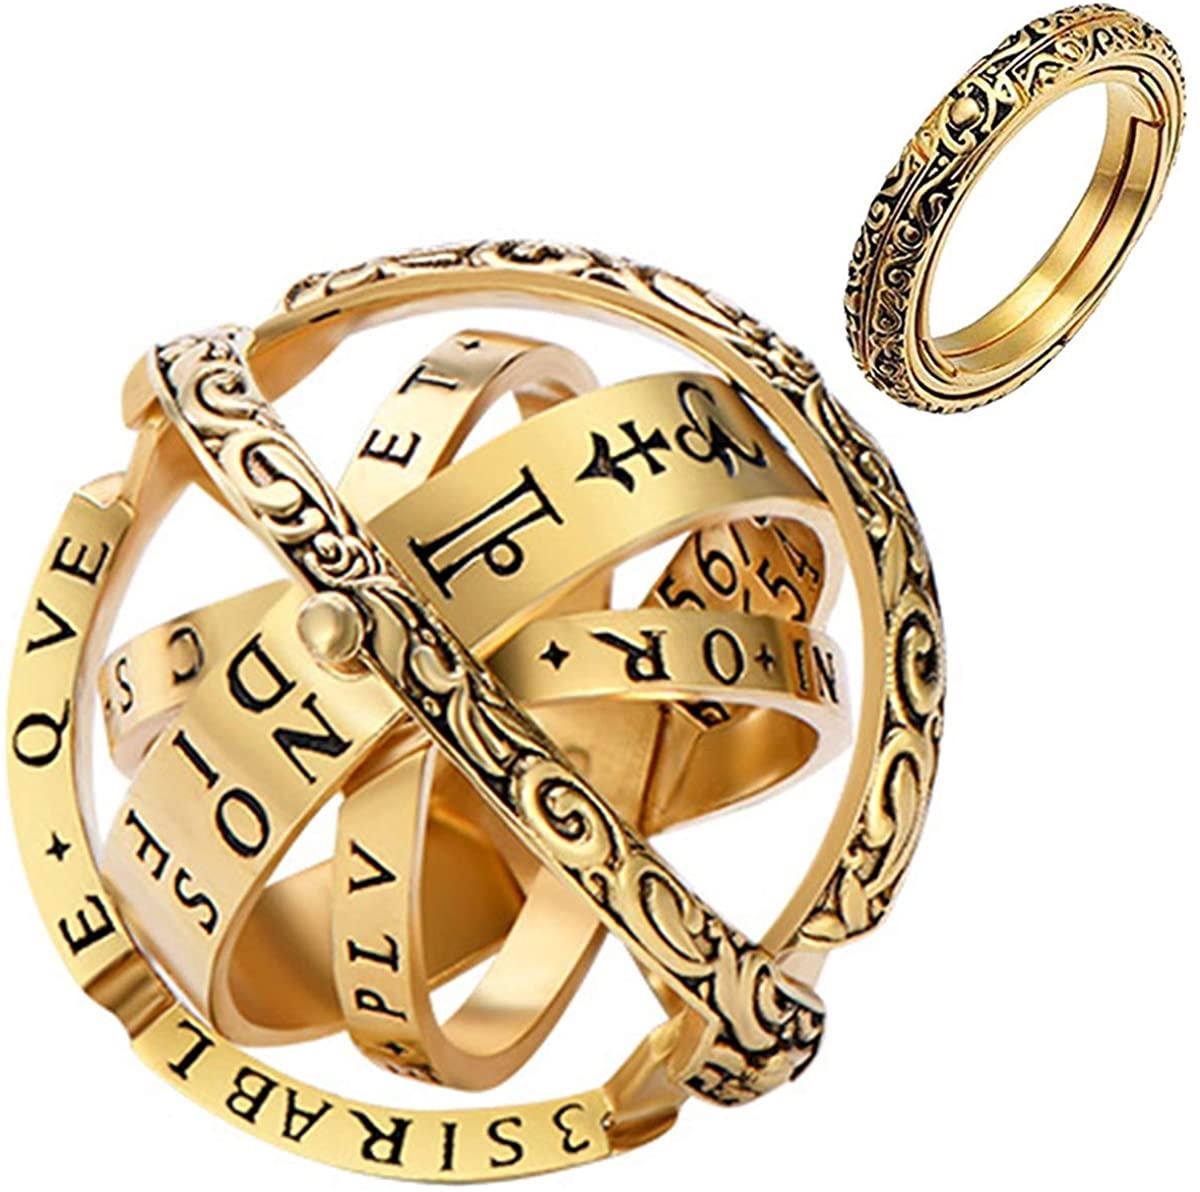 YandMe 2019 New Astronomical Sphere Ball Ring Vintage Foldable Open Cosmic Ring Best Gift for Lover